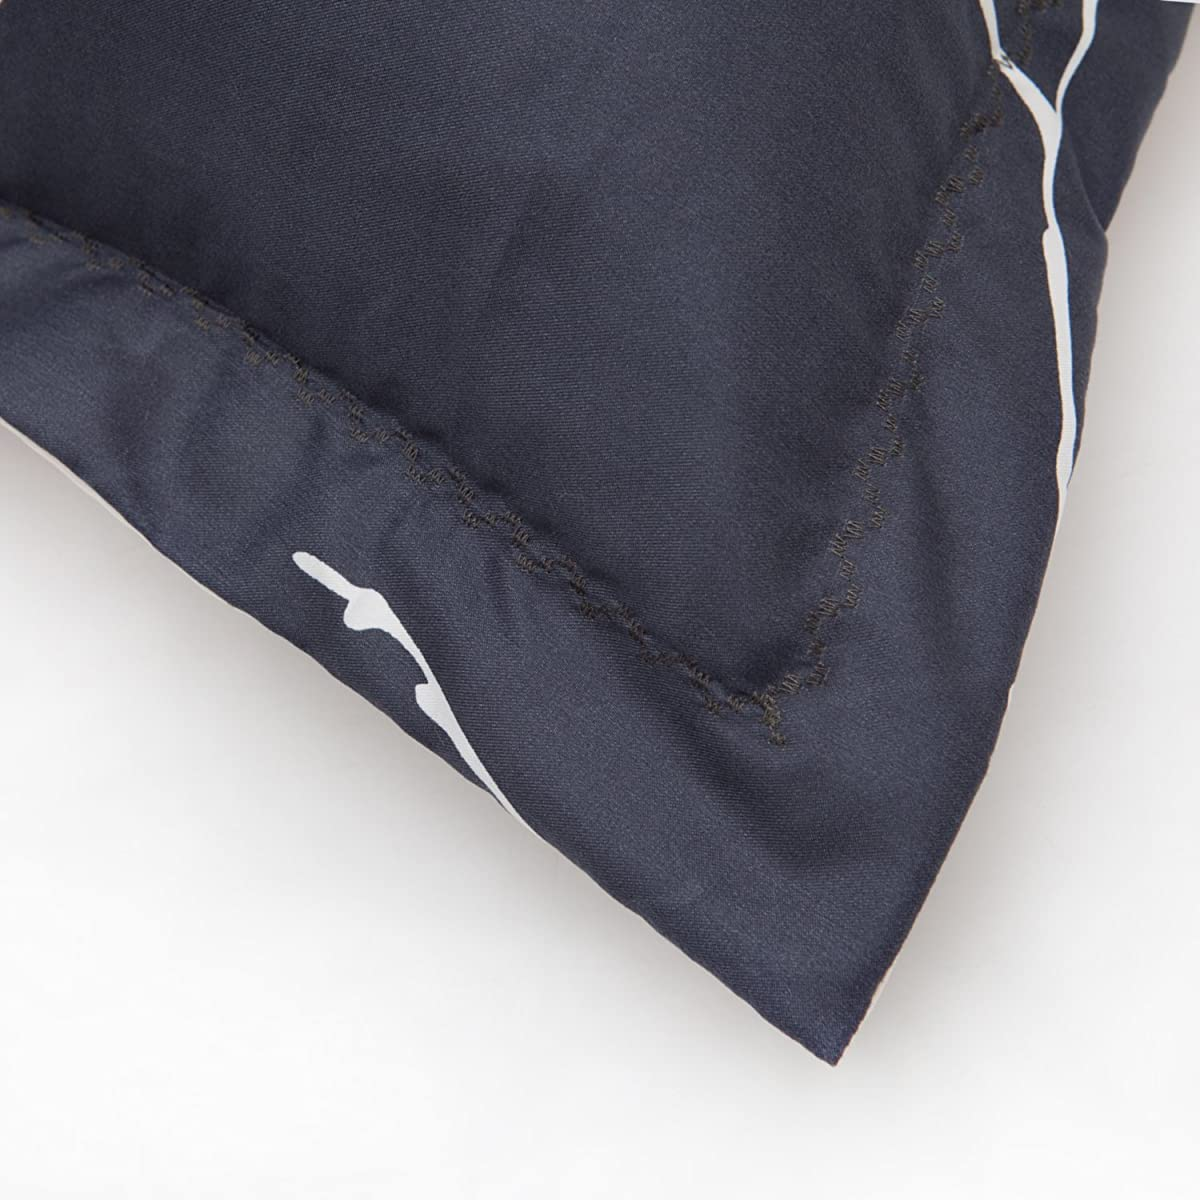 Bedsure 3 Piece Duvet Cover Set (1 Duvet Cover + 2 Pillow Shams) Printed Duvet Cover Queen Set with Ultra-Soft Microfiber Navy